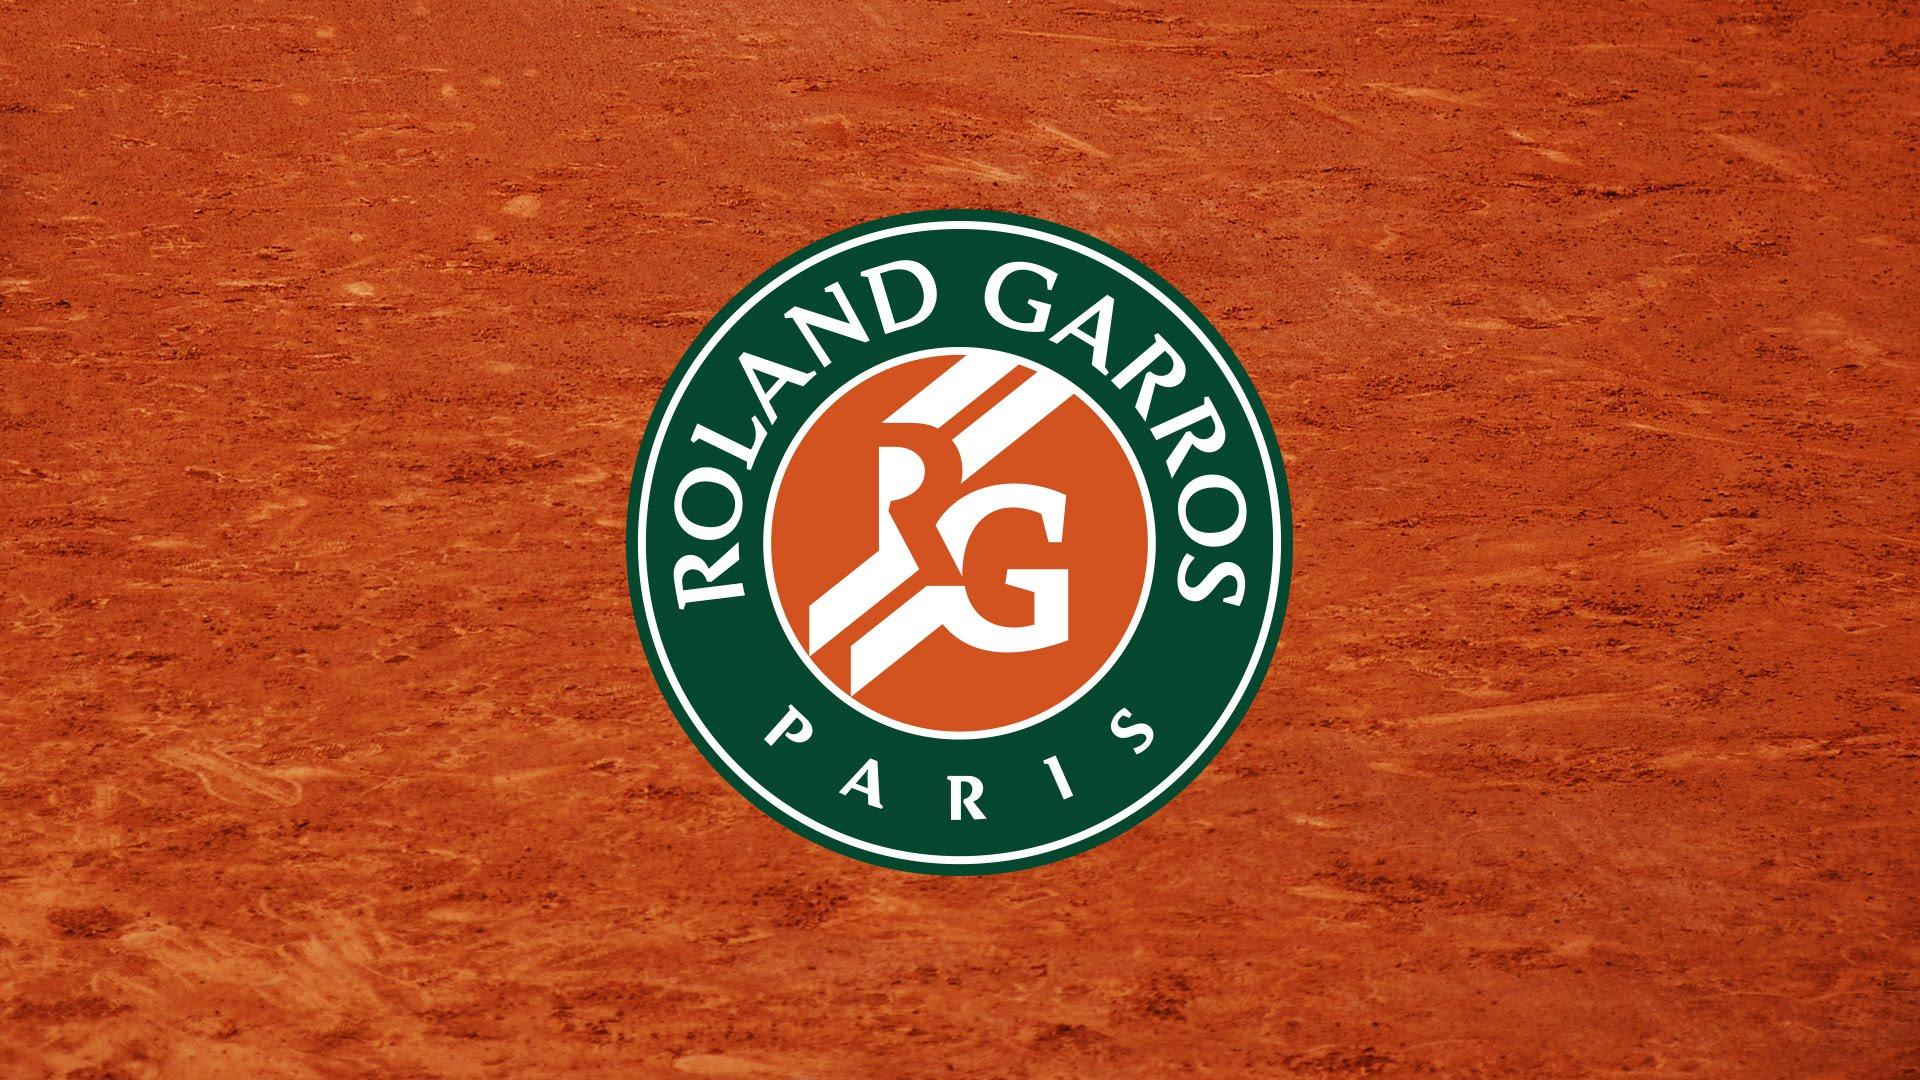 Roland-Garros 2017